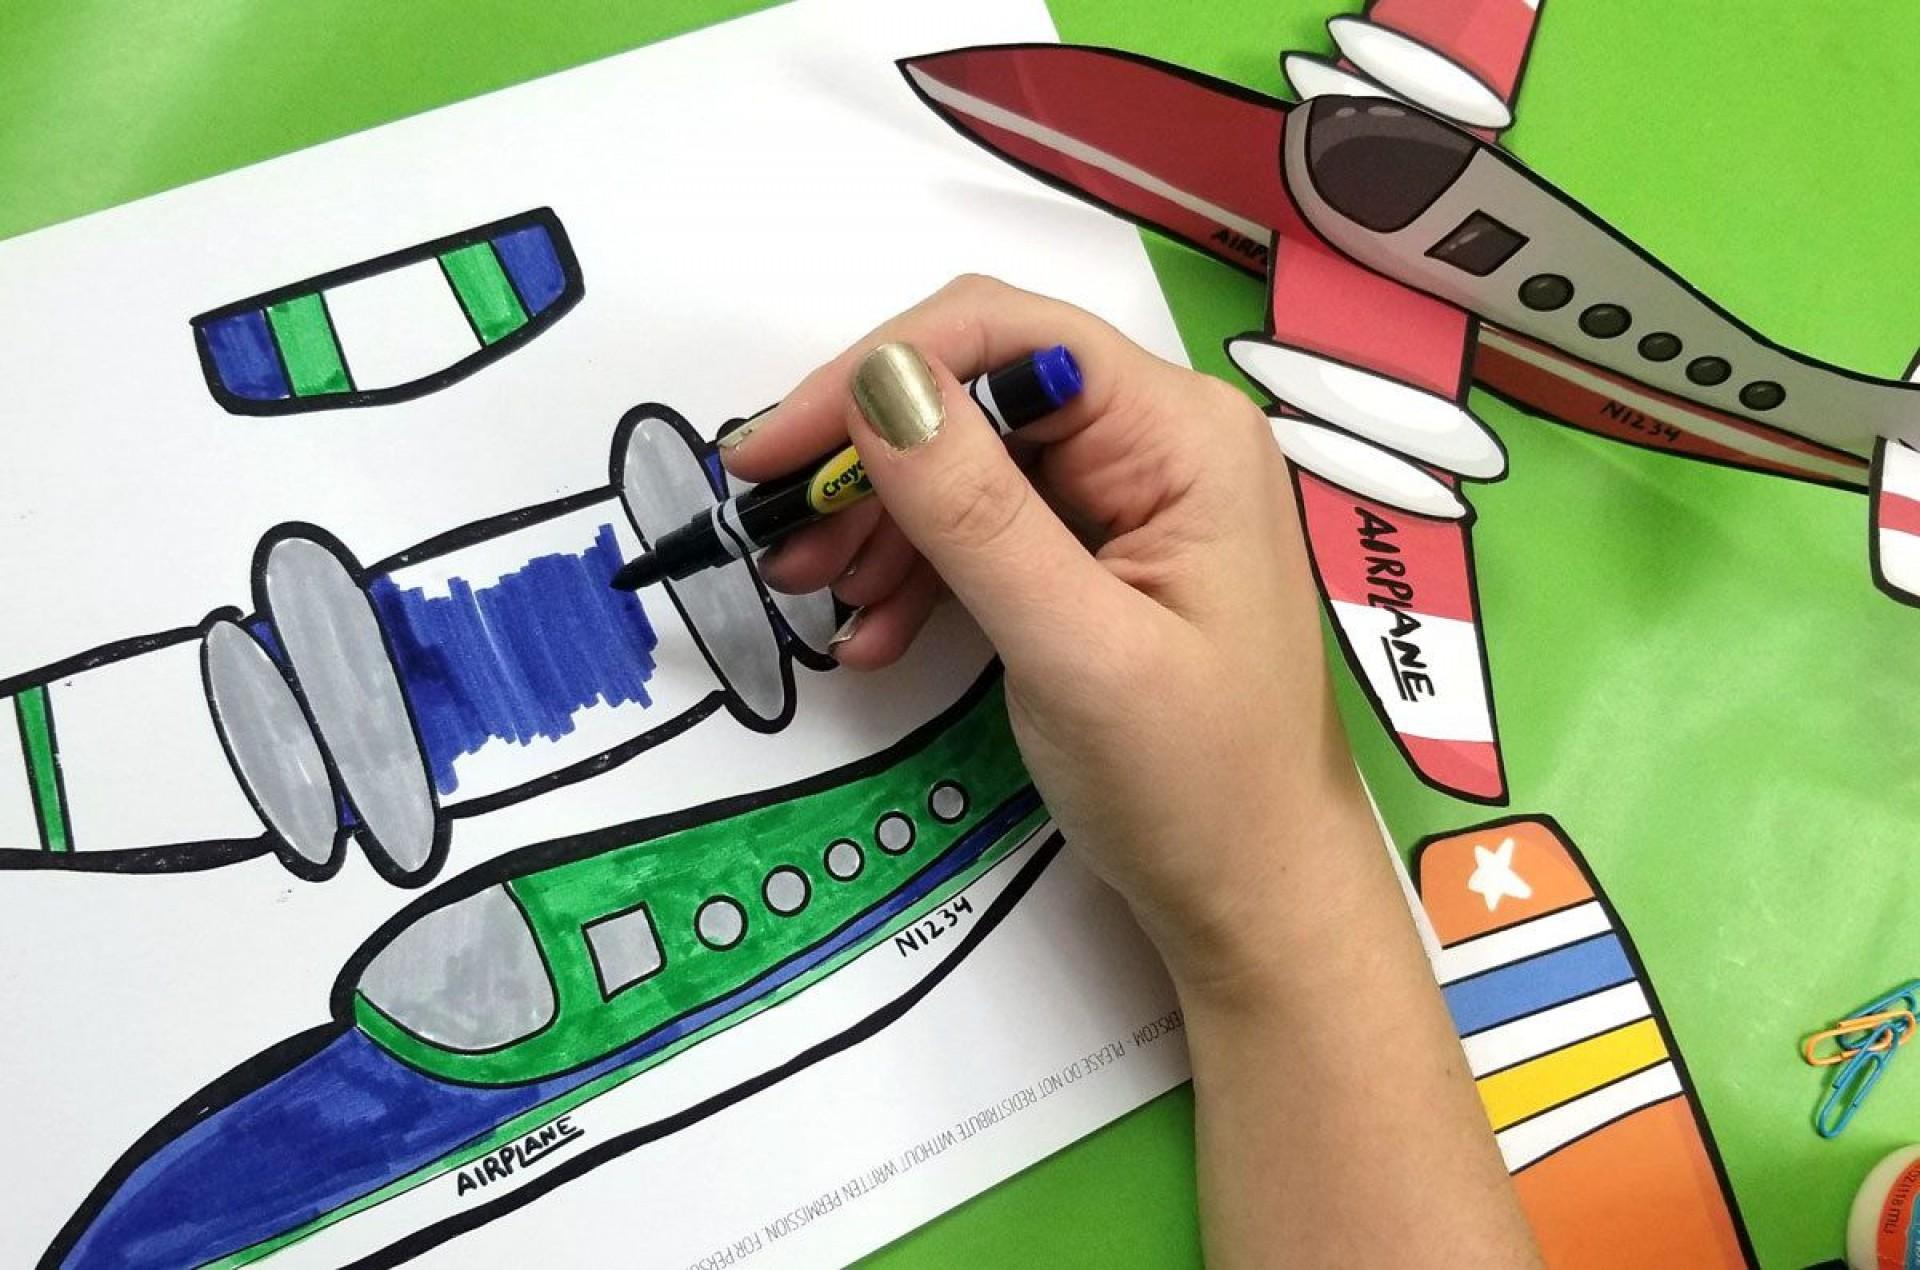 004 Remarkable Printable Paper Plane Plan Design  Plans Airplane Free Instruction1920